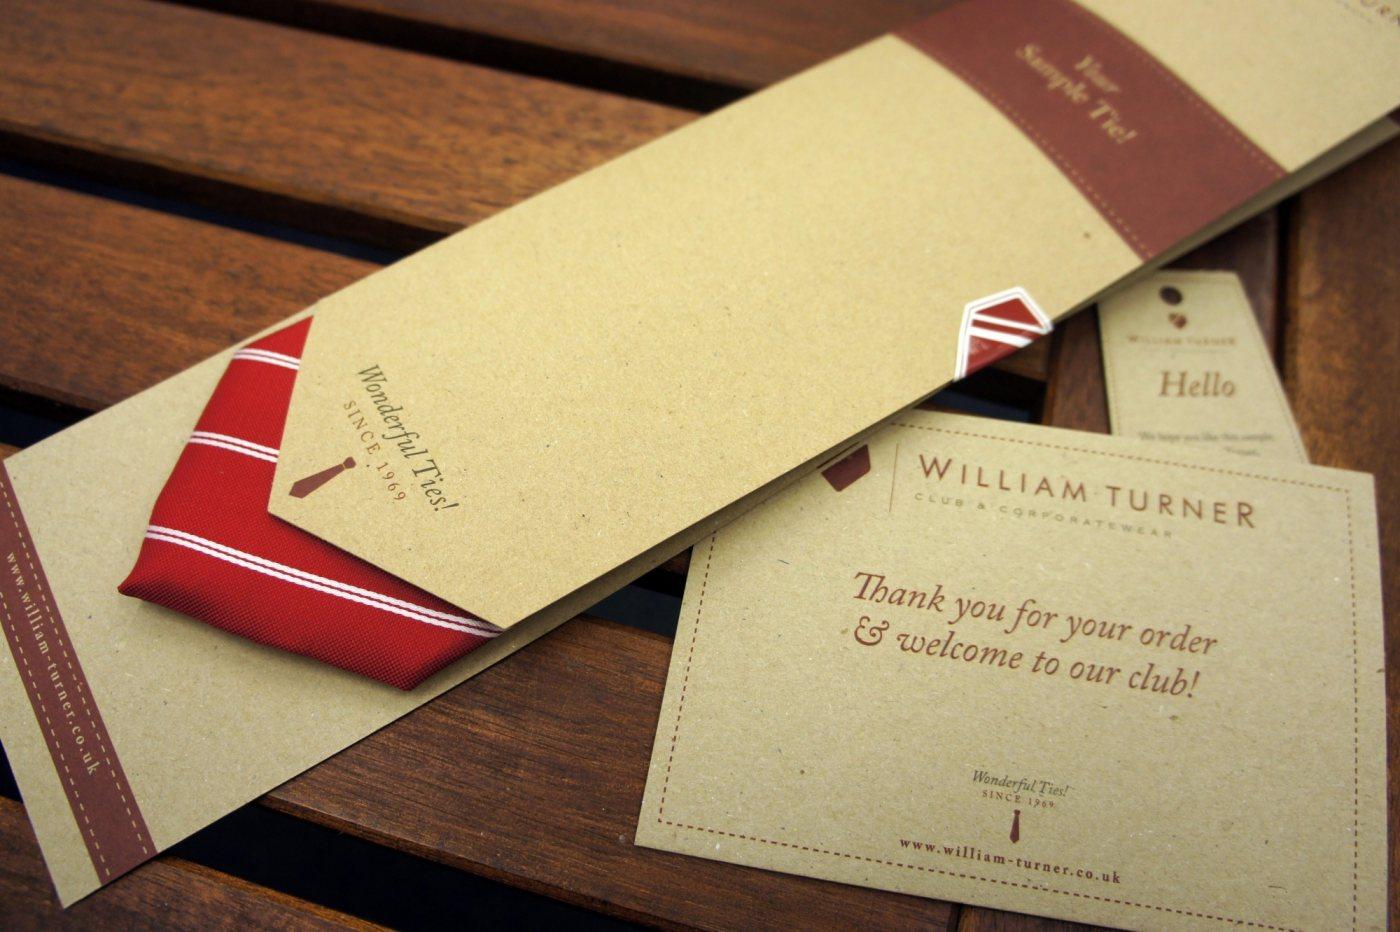 Williamturner wonderfulties